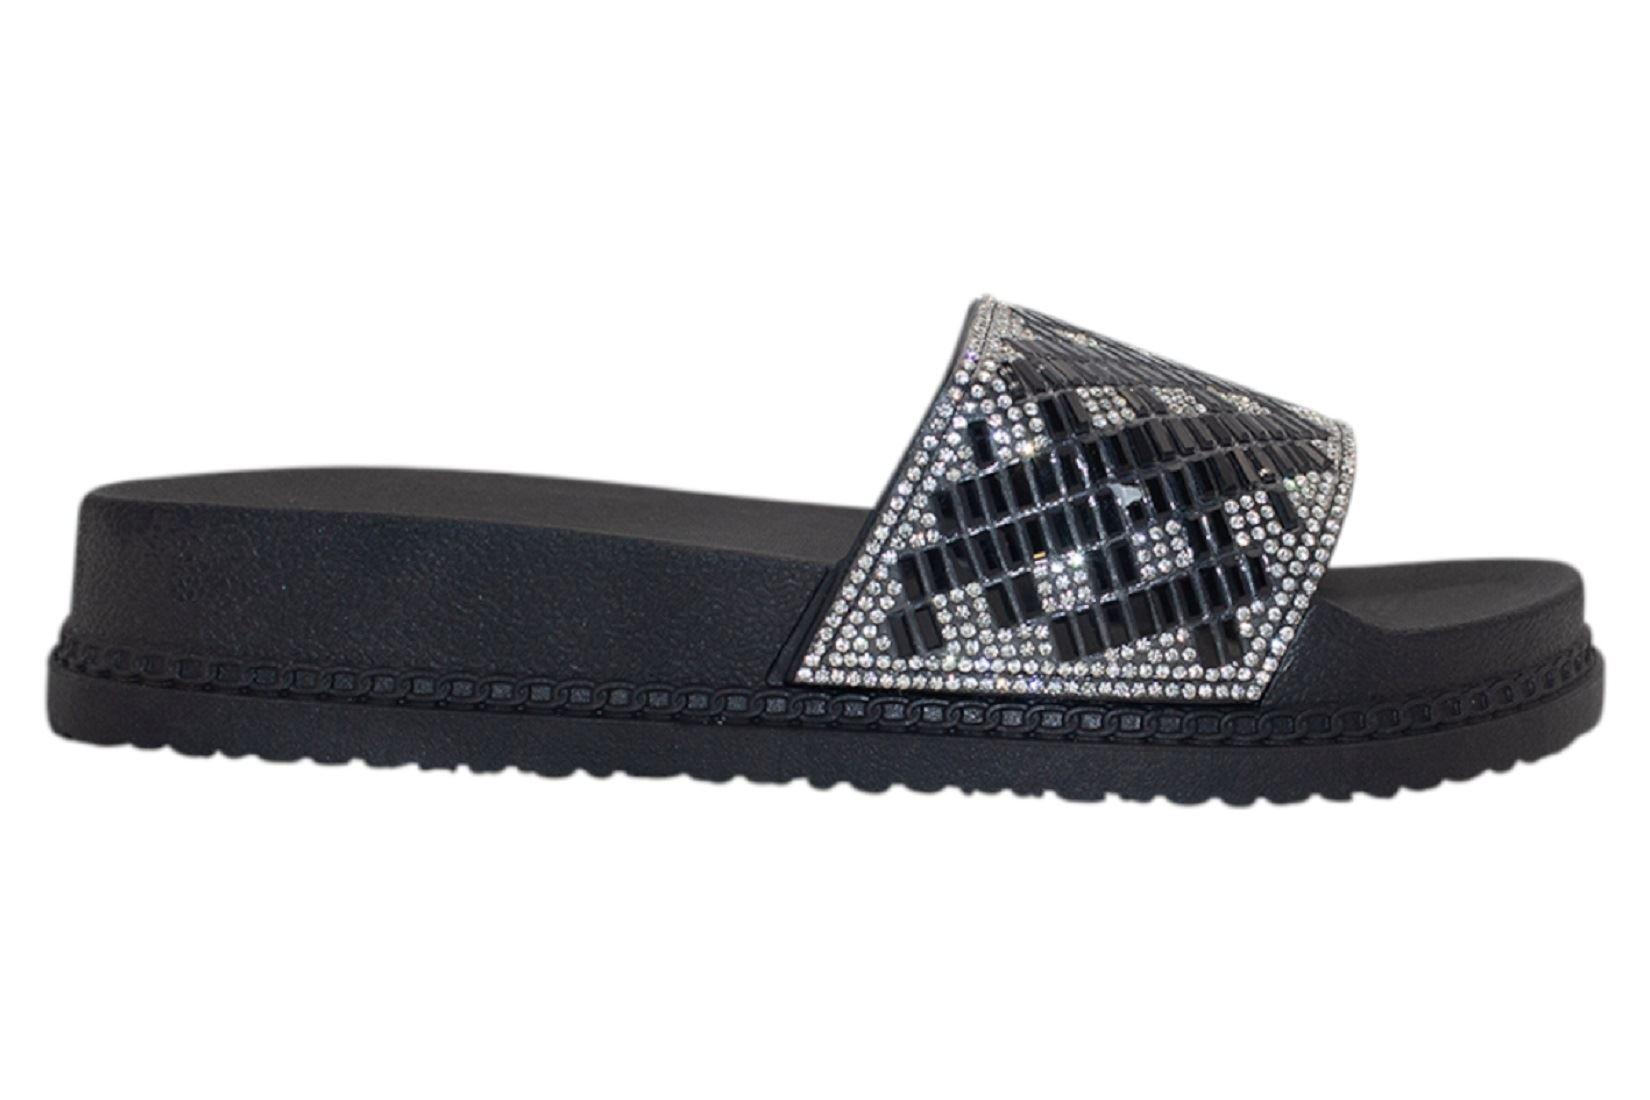 Womens-Sliders-Casual-Slippers-Mules-Ladies-Diamante-Flip-Flop-Sandals-Shoes thumbnail 12